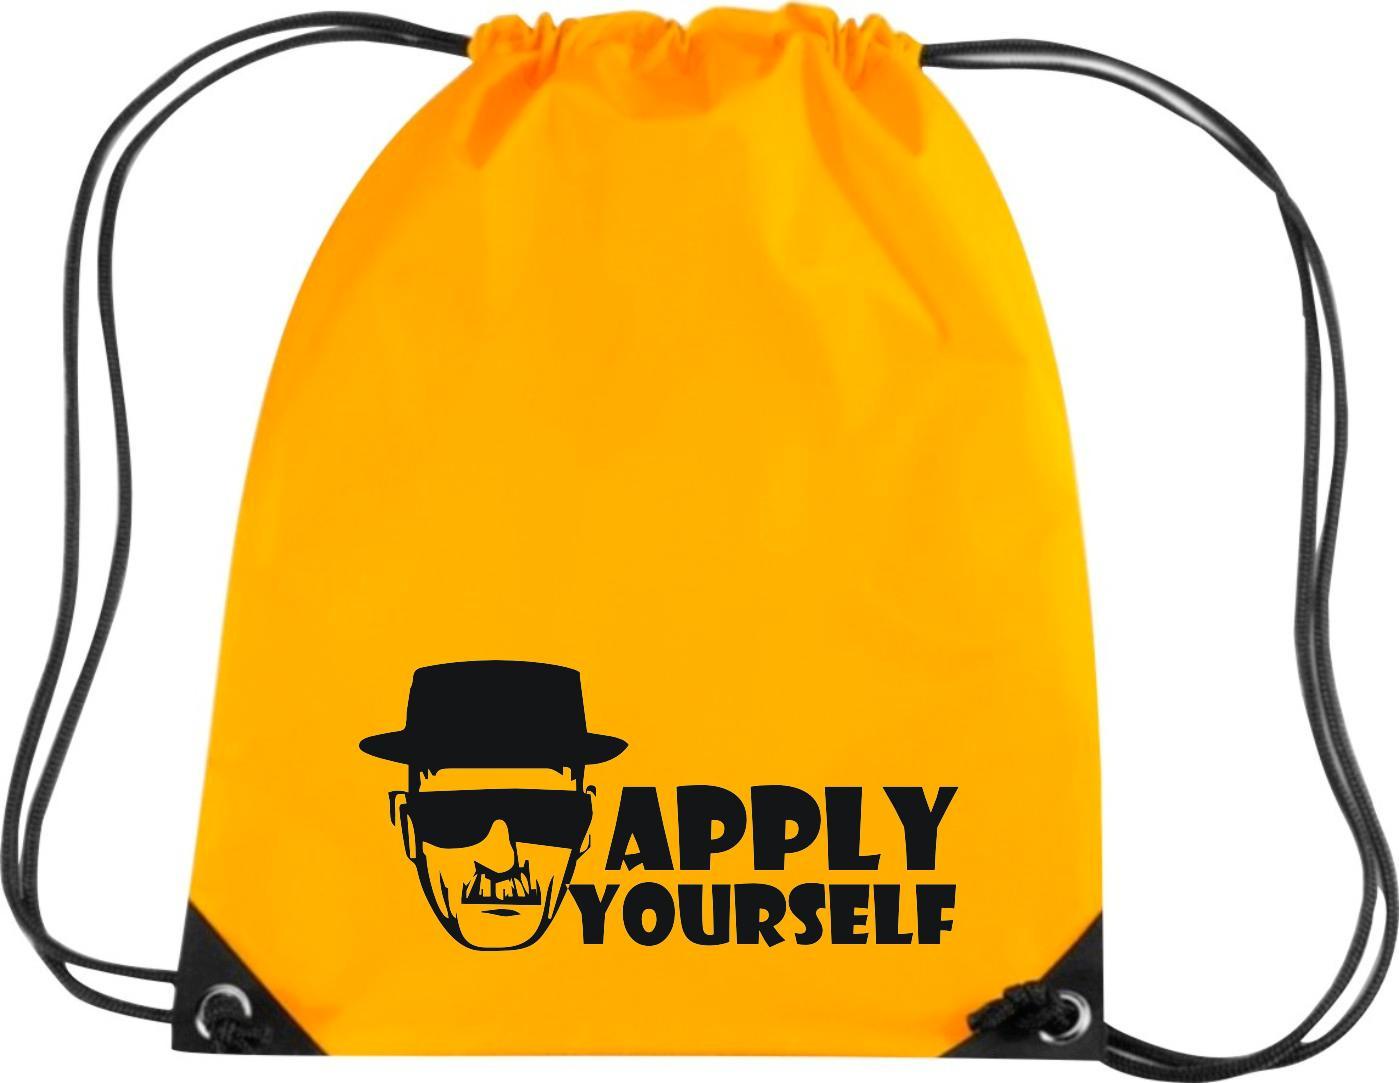 Premium-Gymsac-Breaking-Bad-Apply-yourself